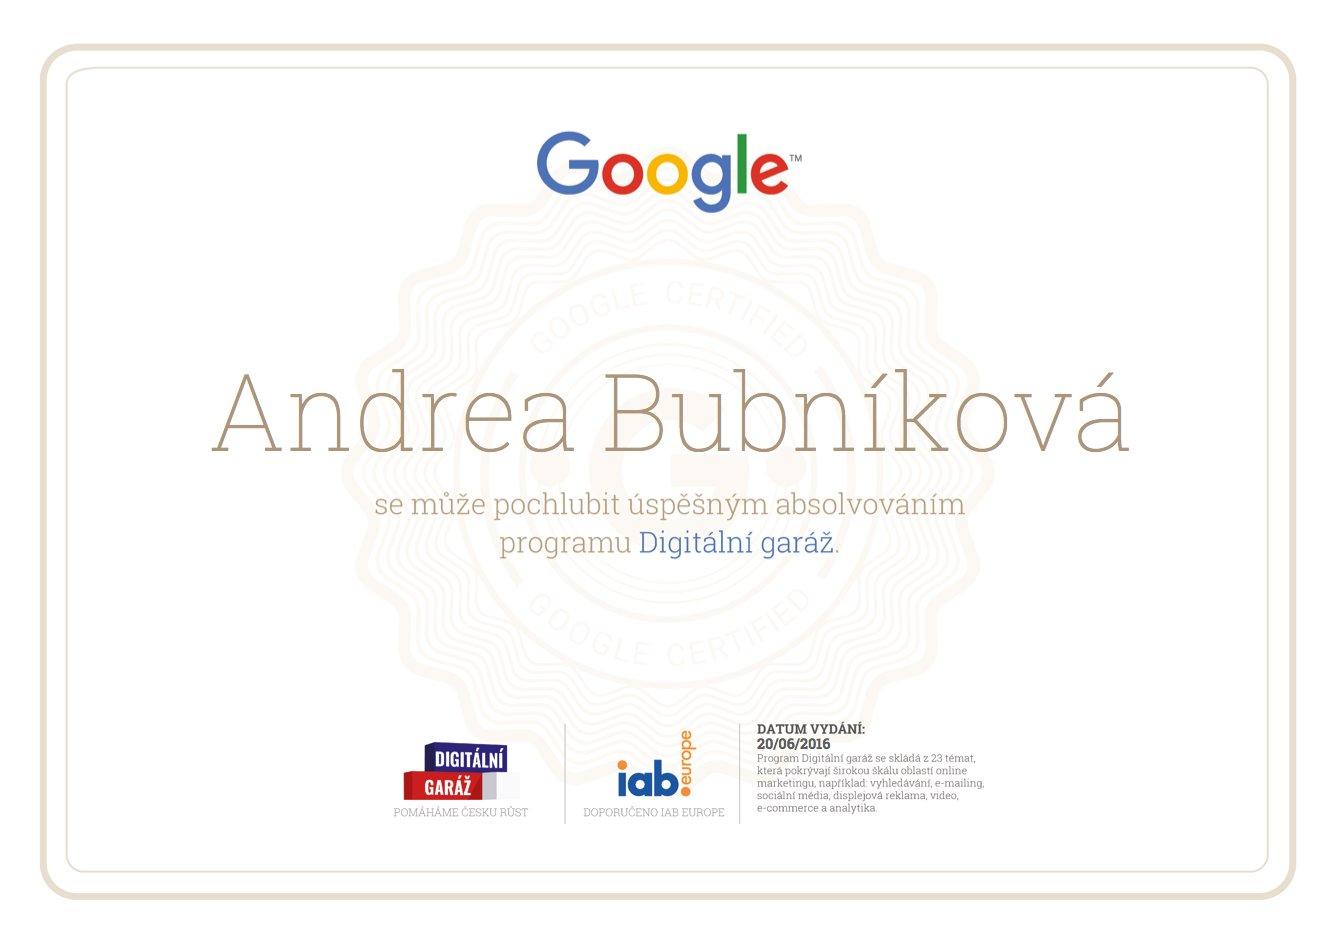 digitalni_garaz_andrea_bubnikova